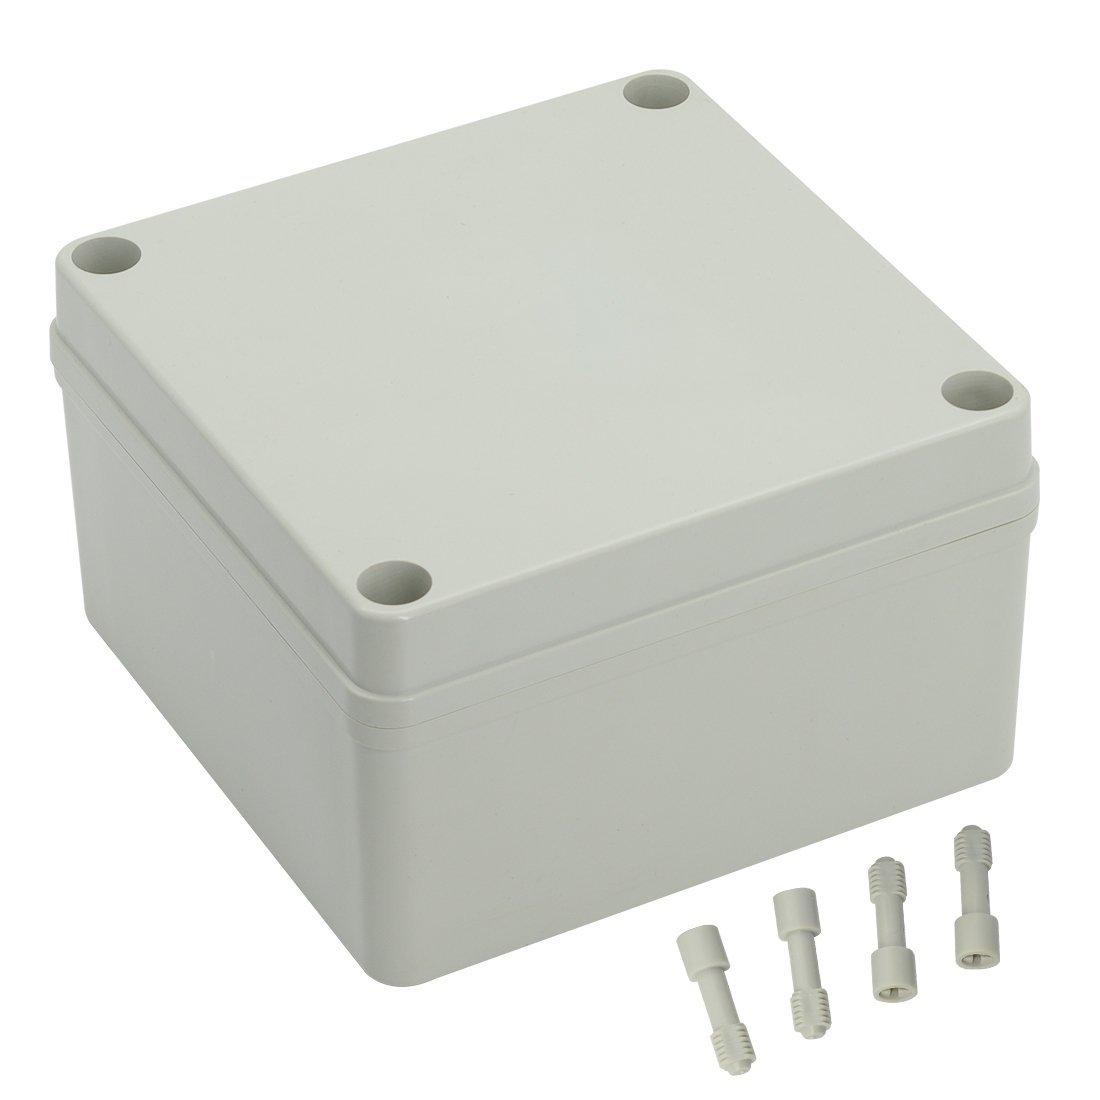 LeMotech Waterproof Dustproof IP67 Junction Box DIY Case Enclosure Gray 4.9' x 4.9' x 3'(125mm x 125mm x 75mm)